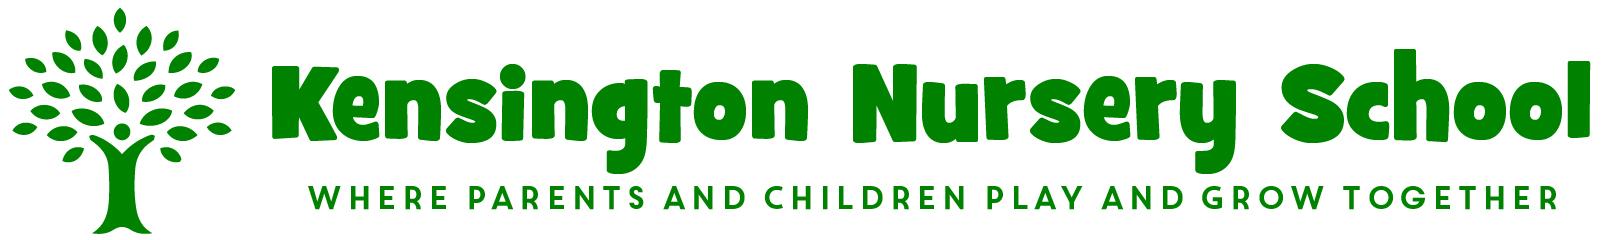 KNS_Logo_Horizontal.jpg